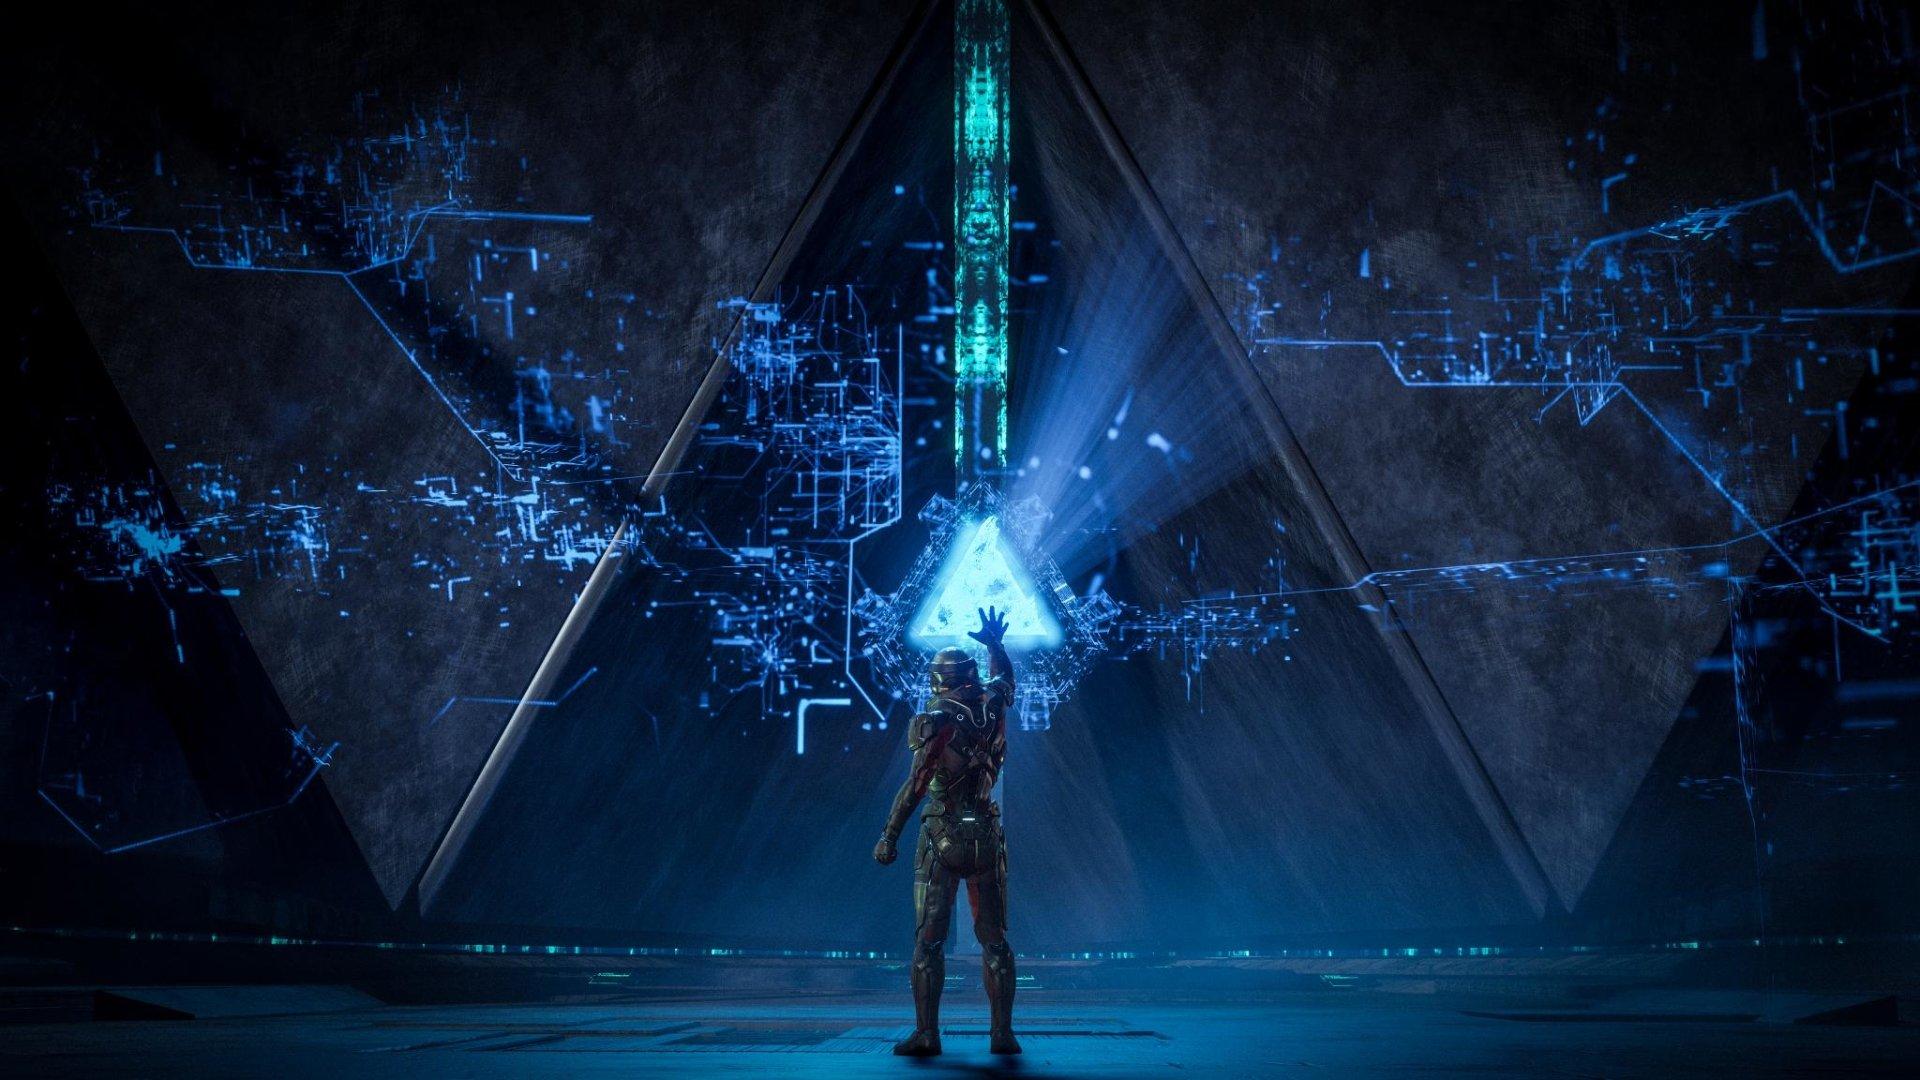 Mass Effect Andromeda Desktop Wallpaper: Save Mass Effect Andromeda HD Wallpapers